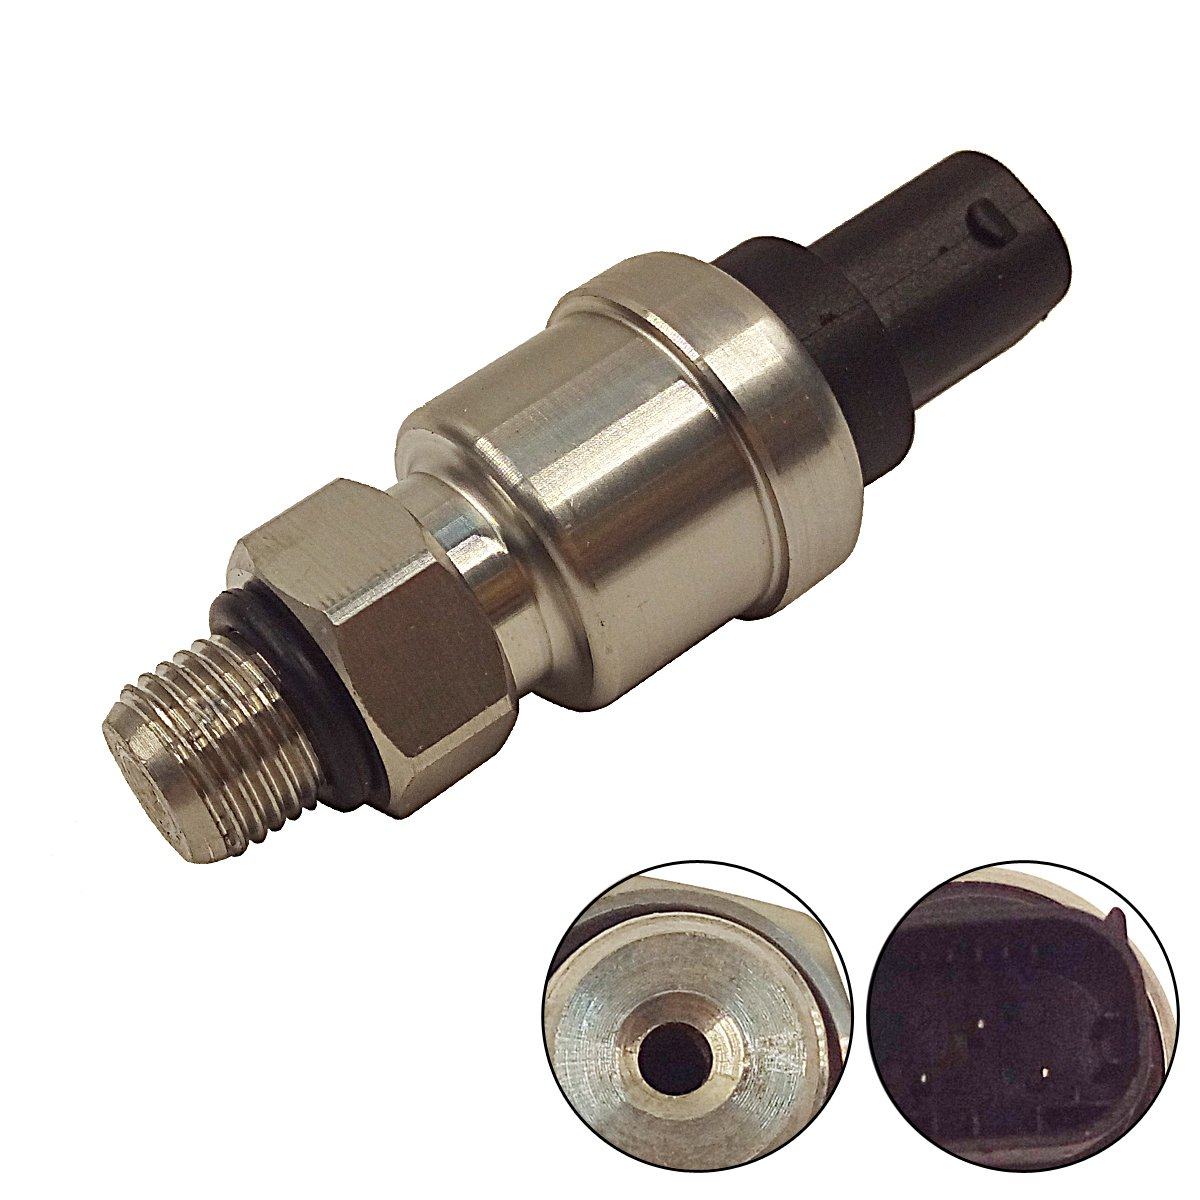 ROHOPE Pressure Sensor LC52S00019P1 for Kobelco SK170-8 SK210-8 SK210LC-8 SK350-8 Pressure Switch Parts